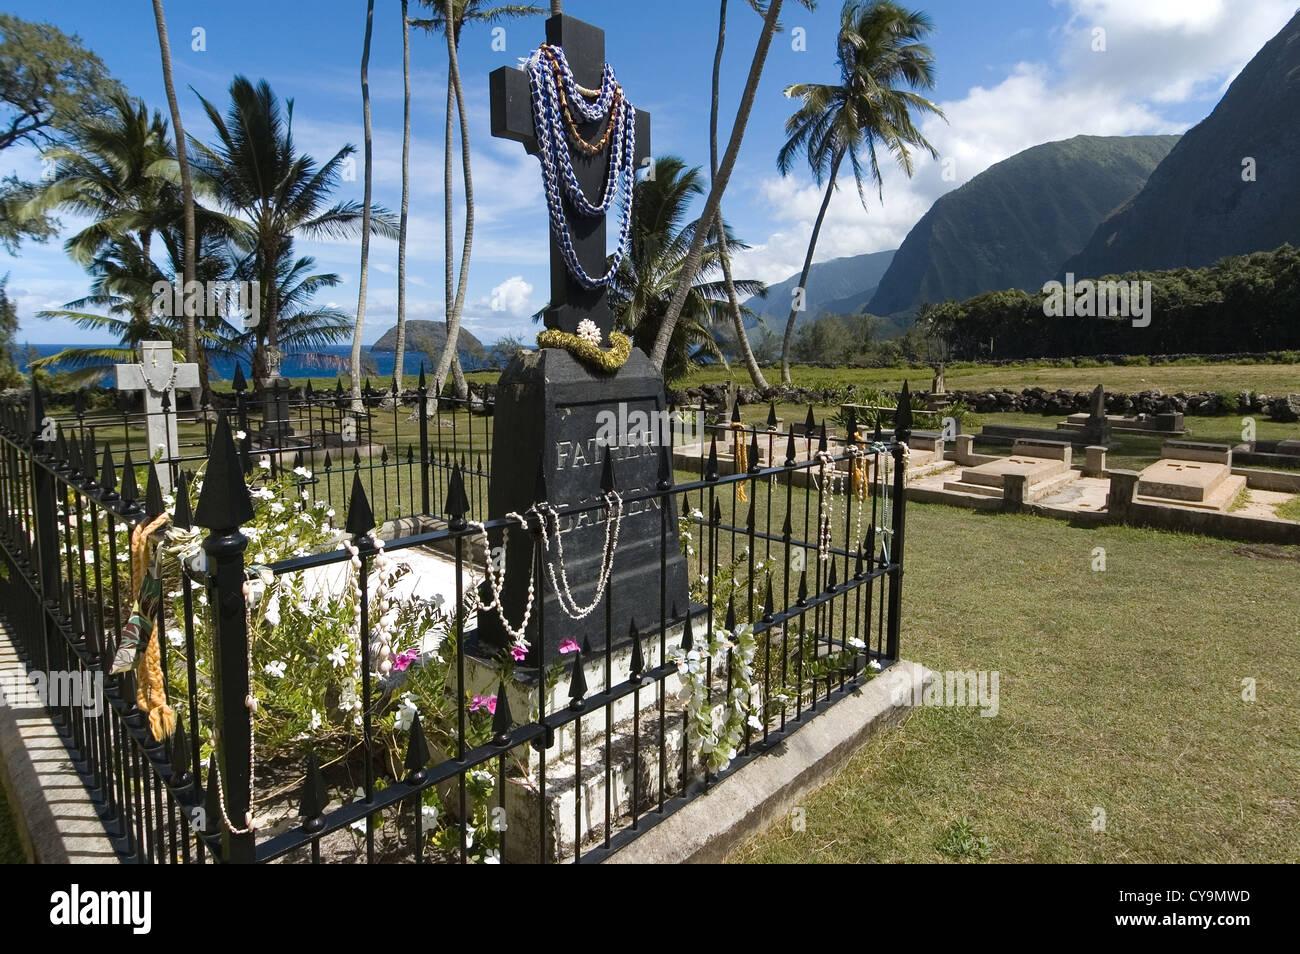 Elk284-6358 Hawaii, Molokai, Kalaupapa Peninsula NHP, St Philomena Church, Father Damien grave - Stock Image